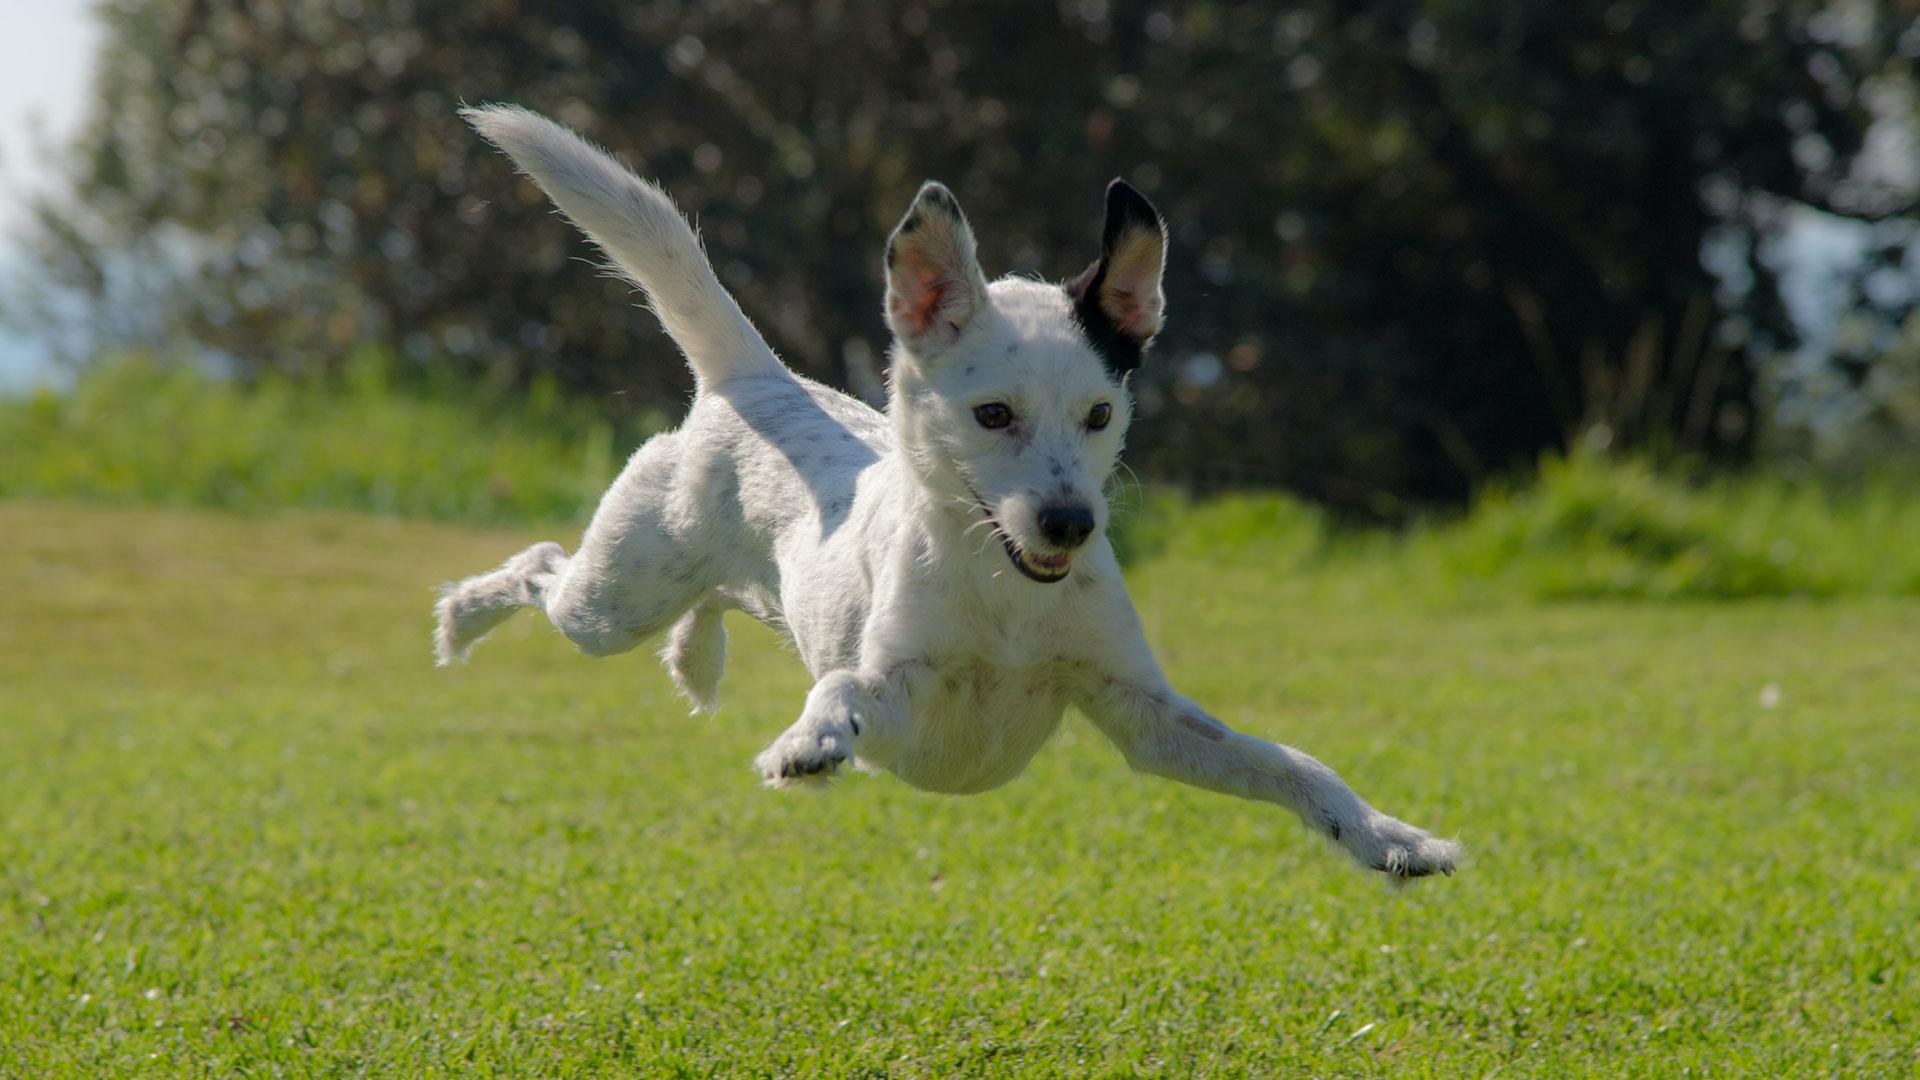 Dog playing at the Greenway Farms dog park